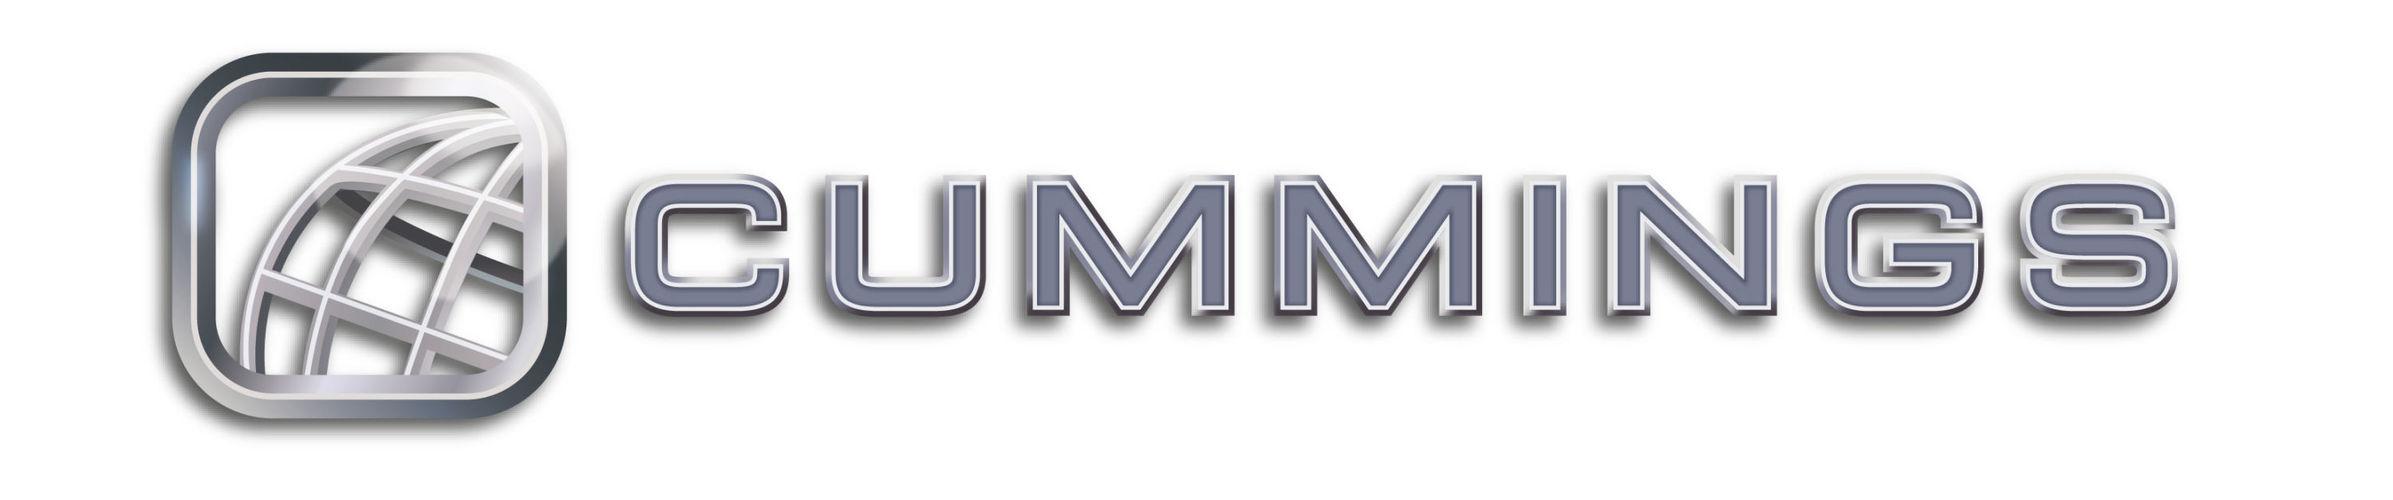 Cummings Resources